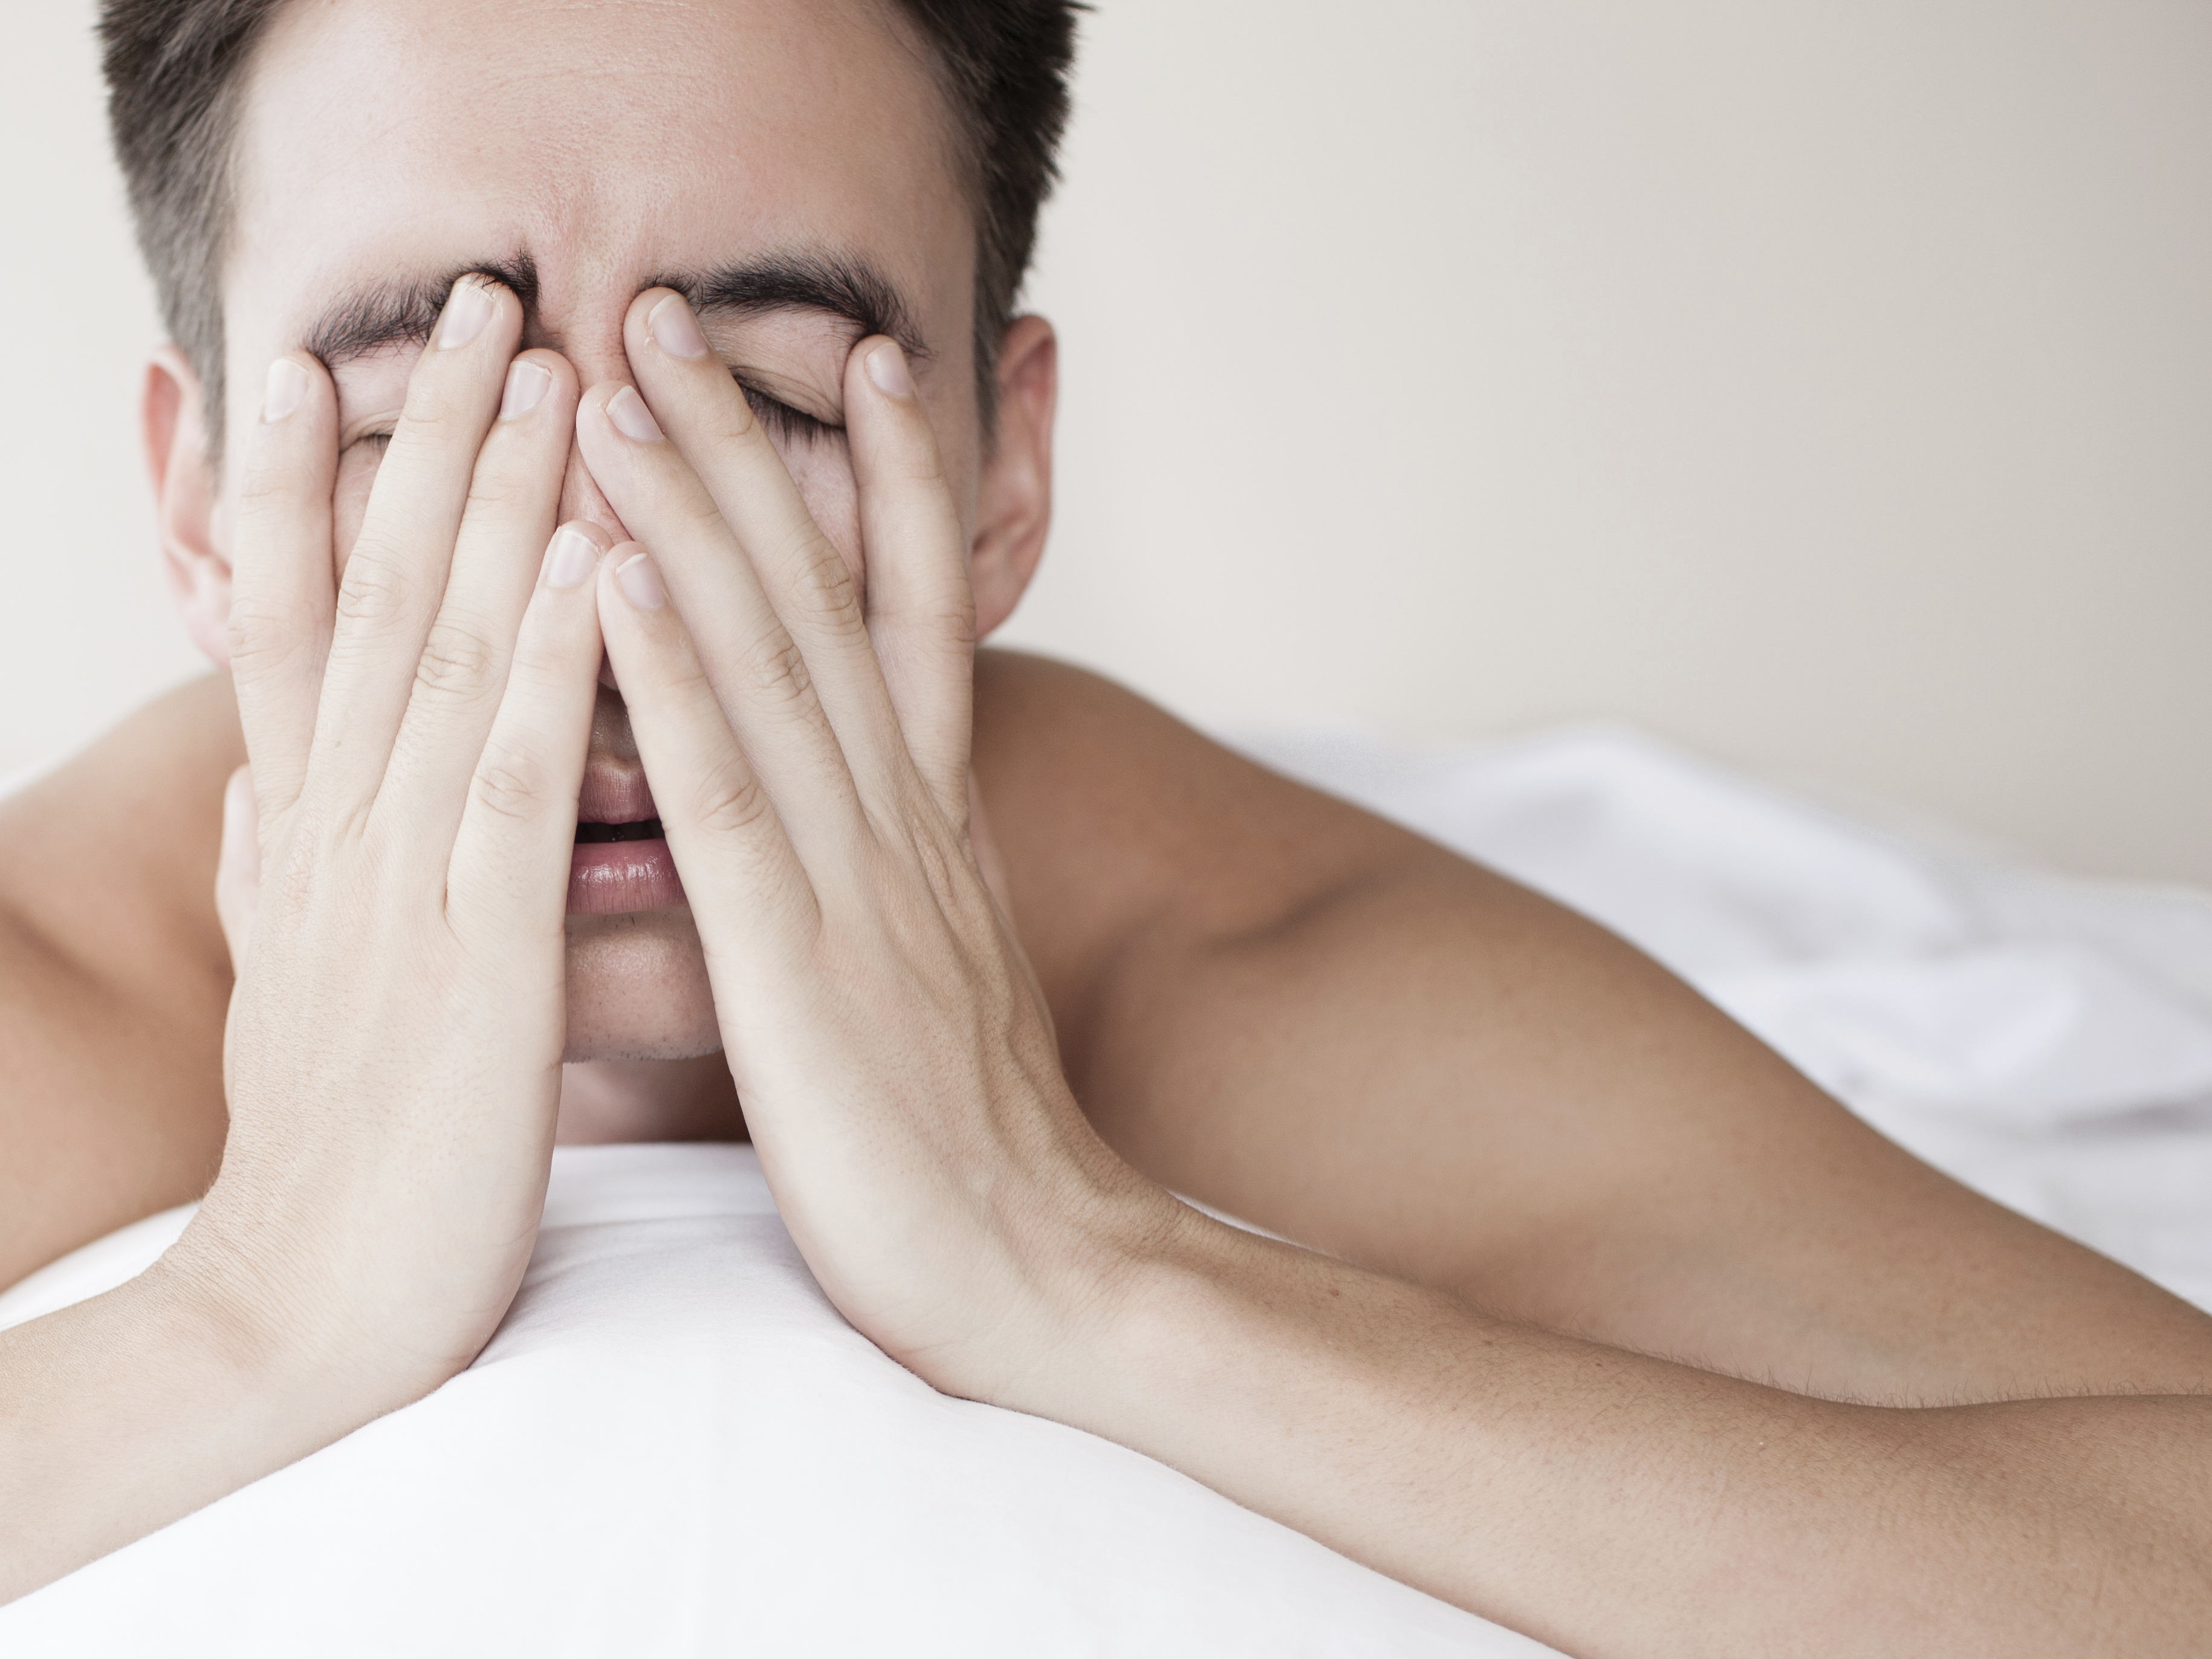 The sleep help that backfires